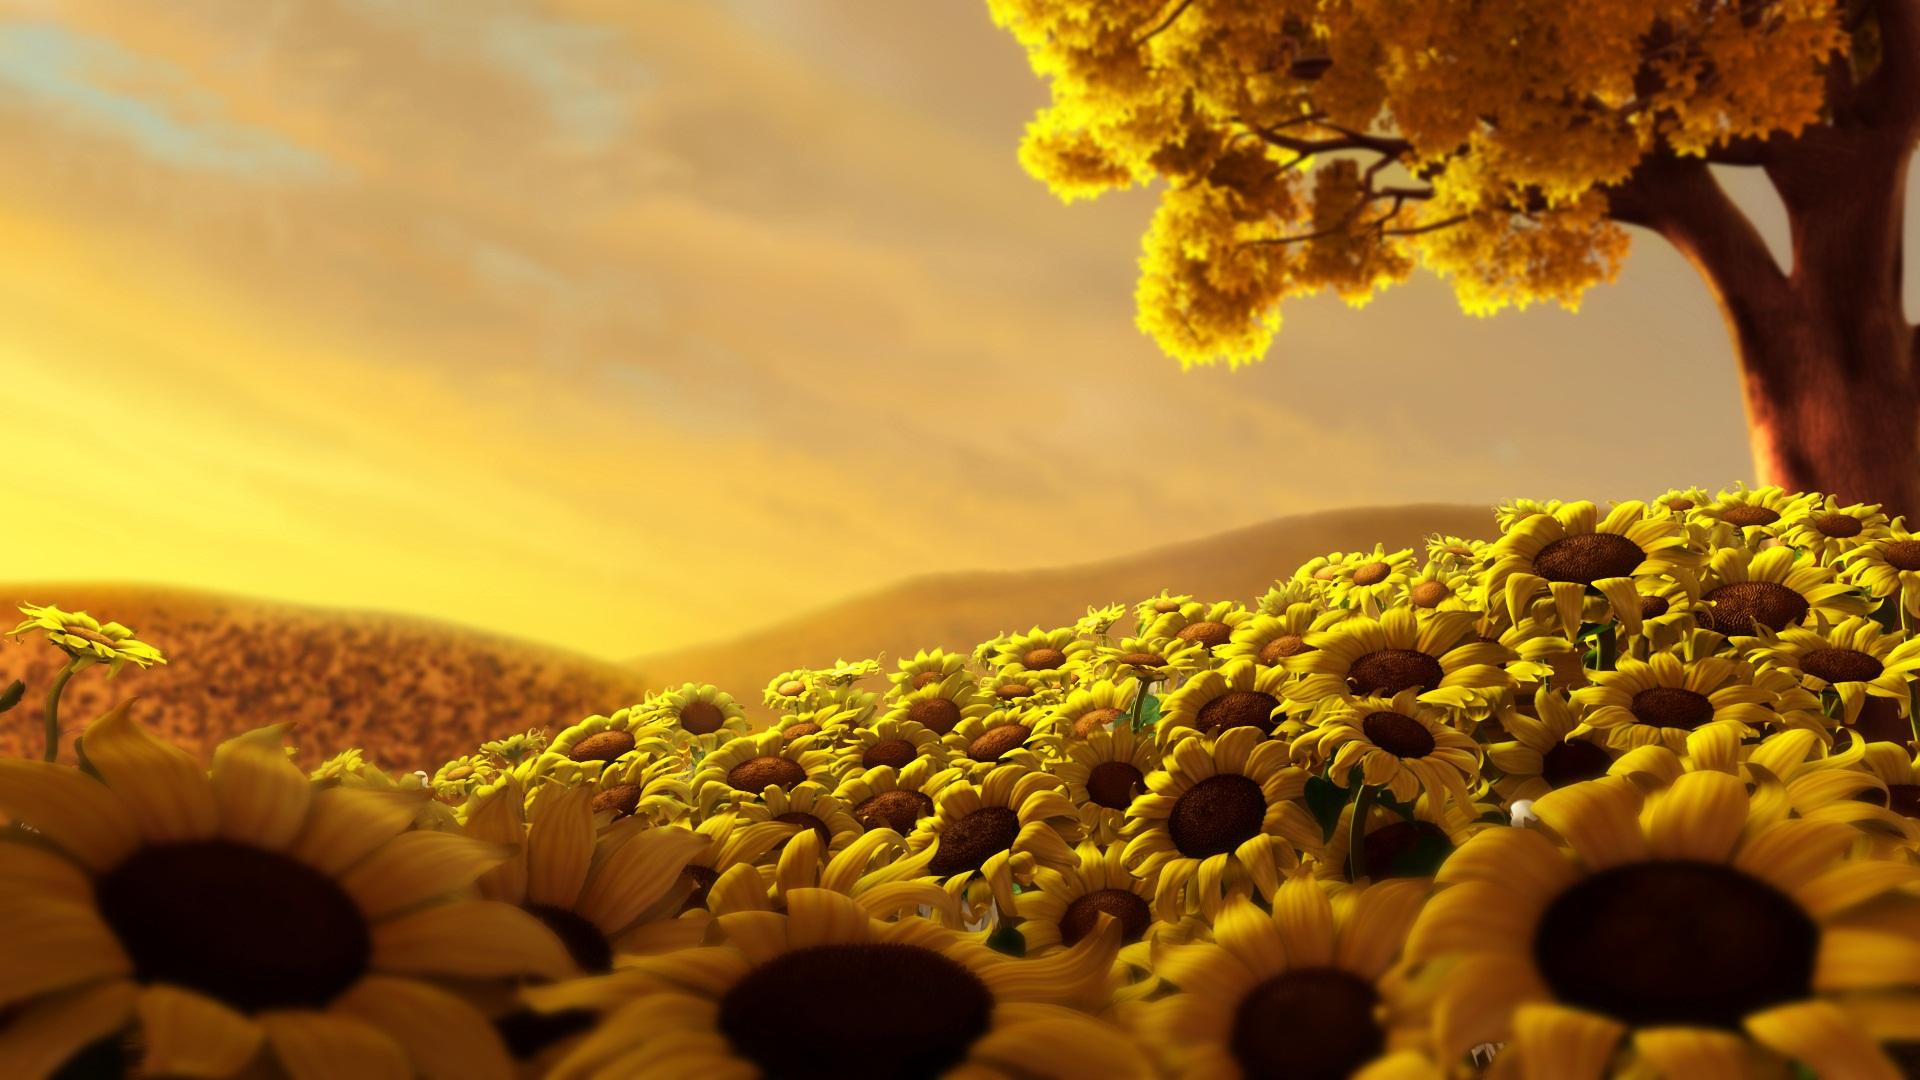 Fondos Flores ADNFriki (3)